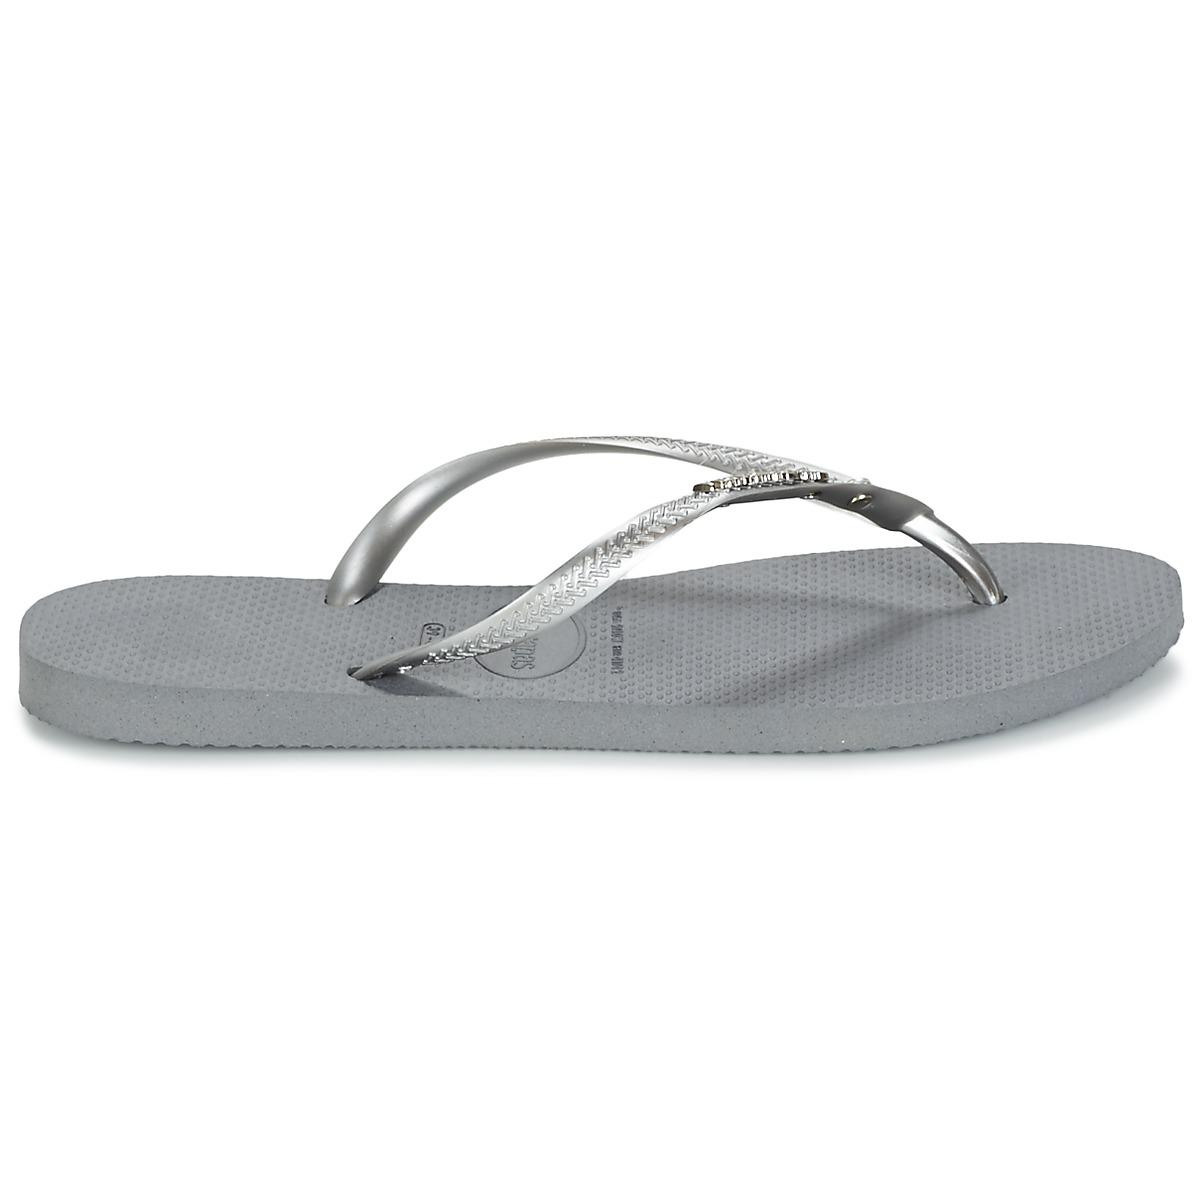 ac9afb08e86d4b Havaianas Slim Metal Logo And Crystal Women s Flip Flops   Sandals ...